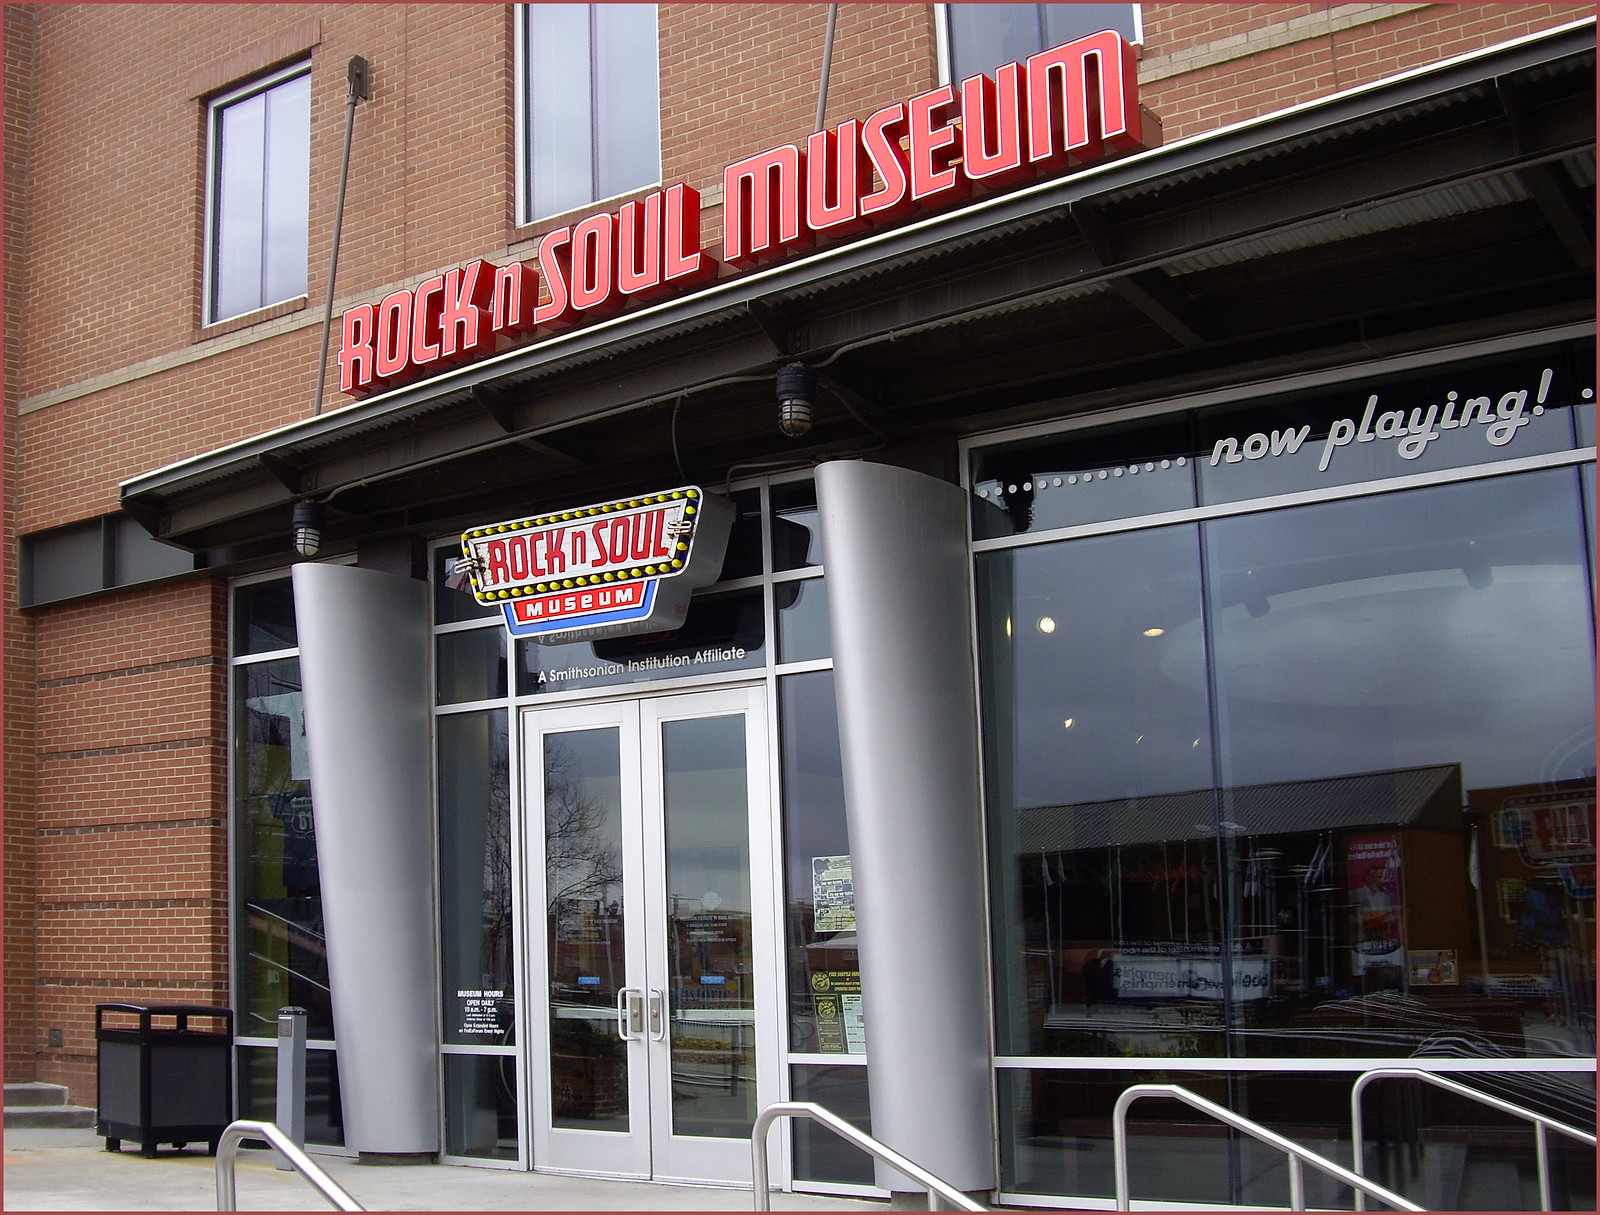 Entrance to the Rock-n-Soul Museum Memphis (TN) 2013